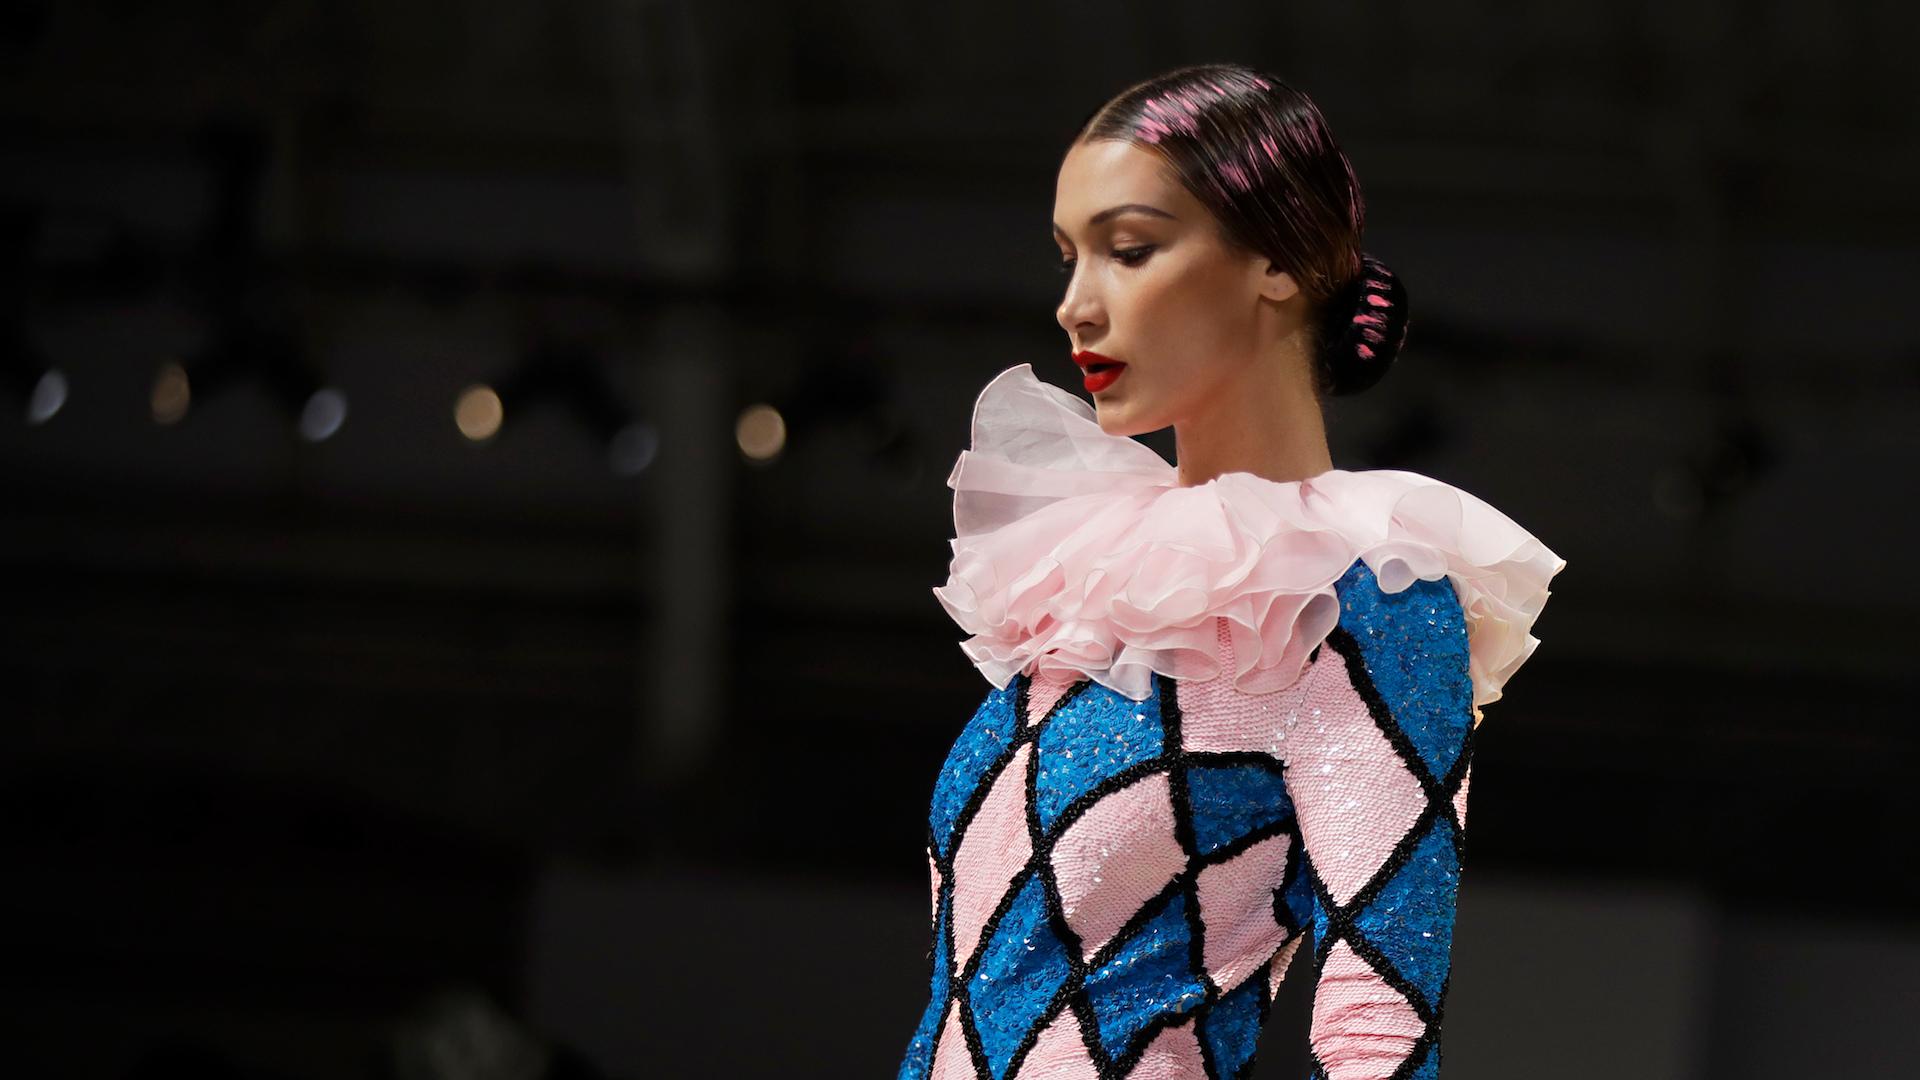 The Moschino Milan Fashion Week Runway Show was Beyond My Wildest (and Weirdest) Dreams